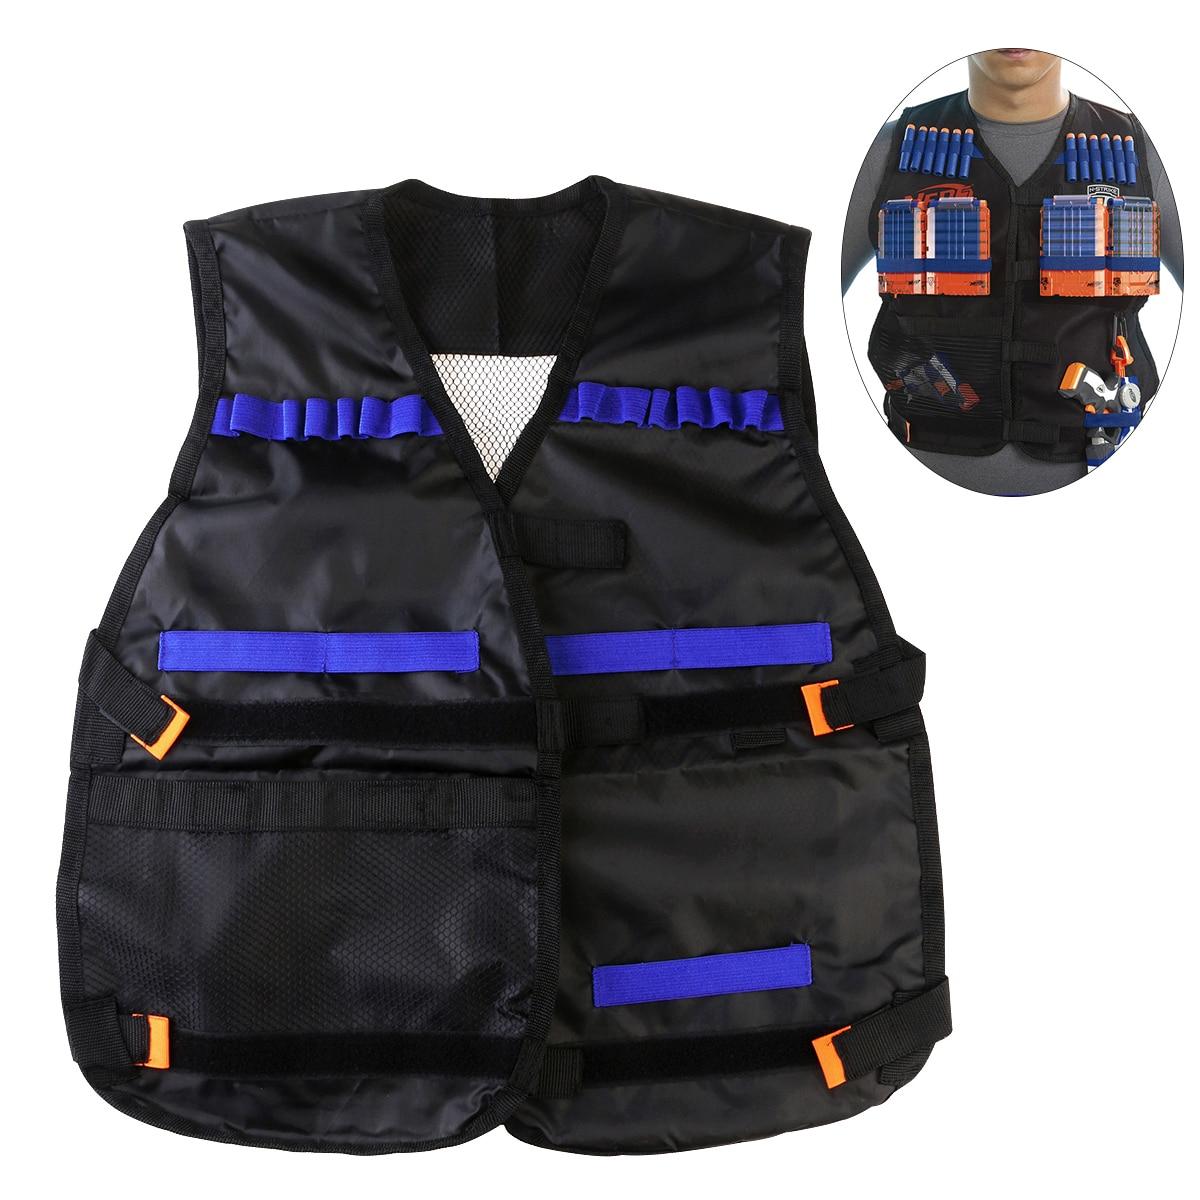 A Tactical Vest Kids Toy Gun Clip Jacket Foam Bullet Ammunition Holder